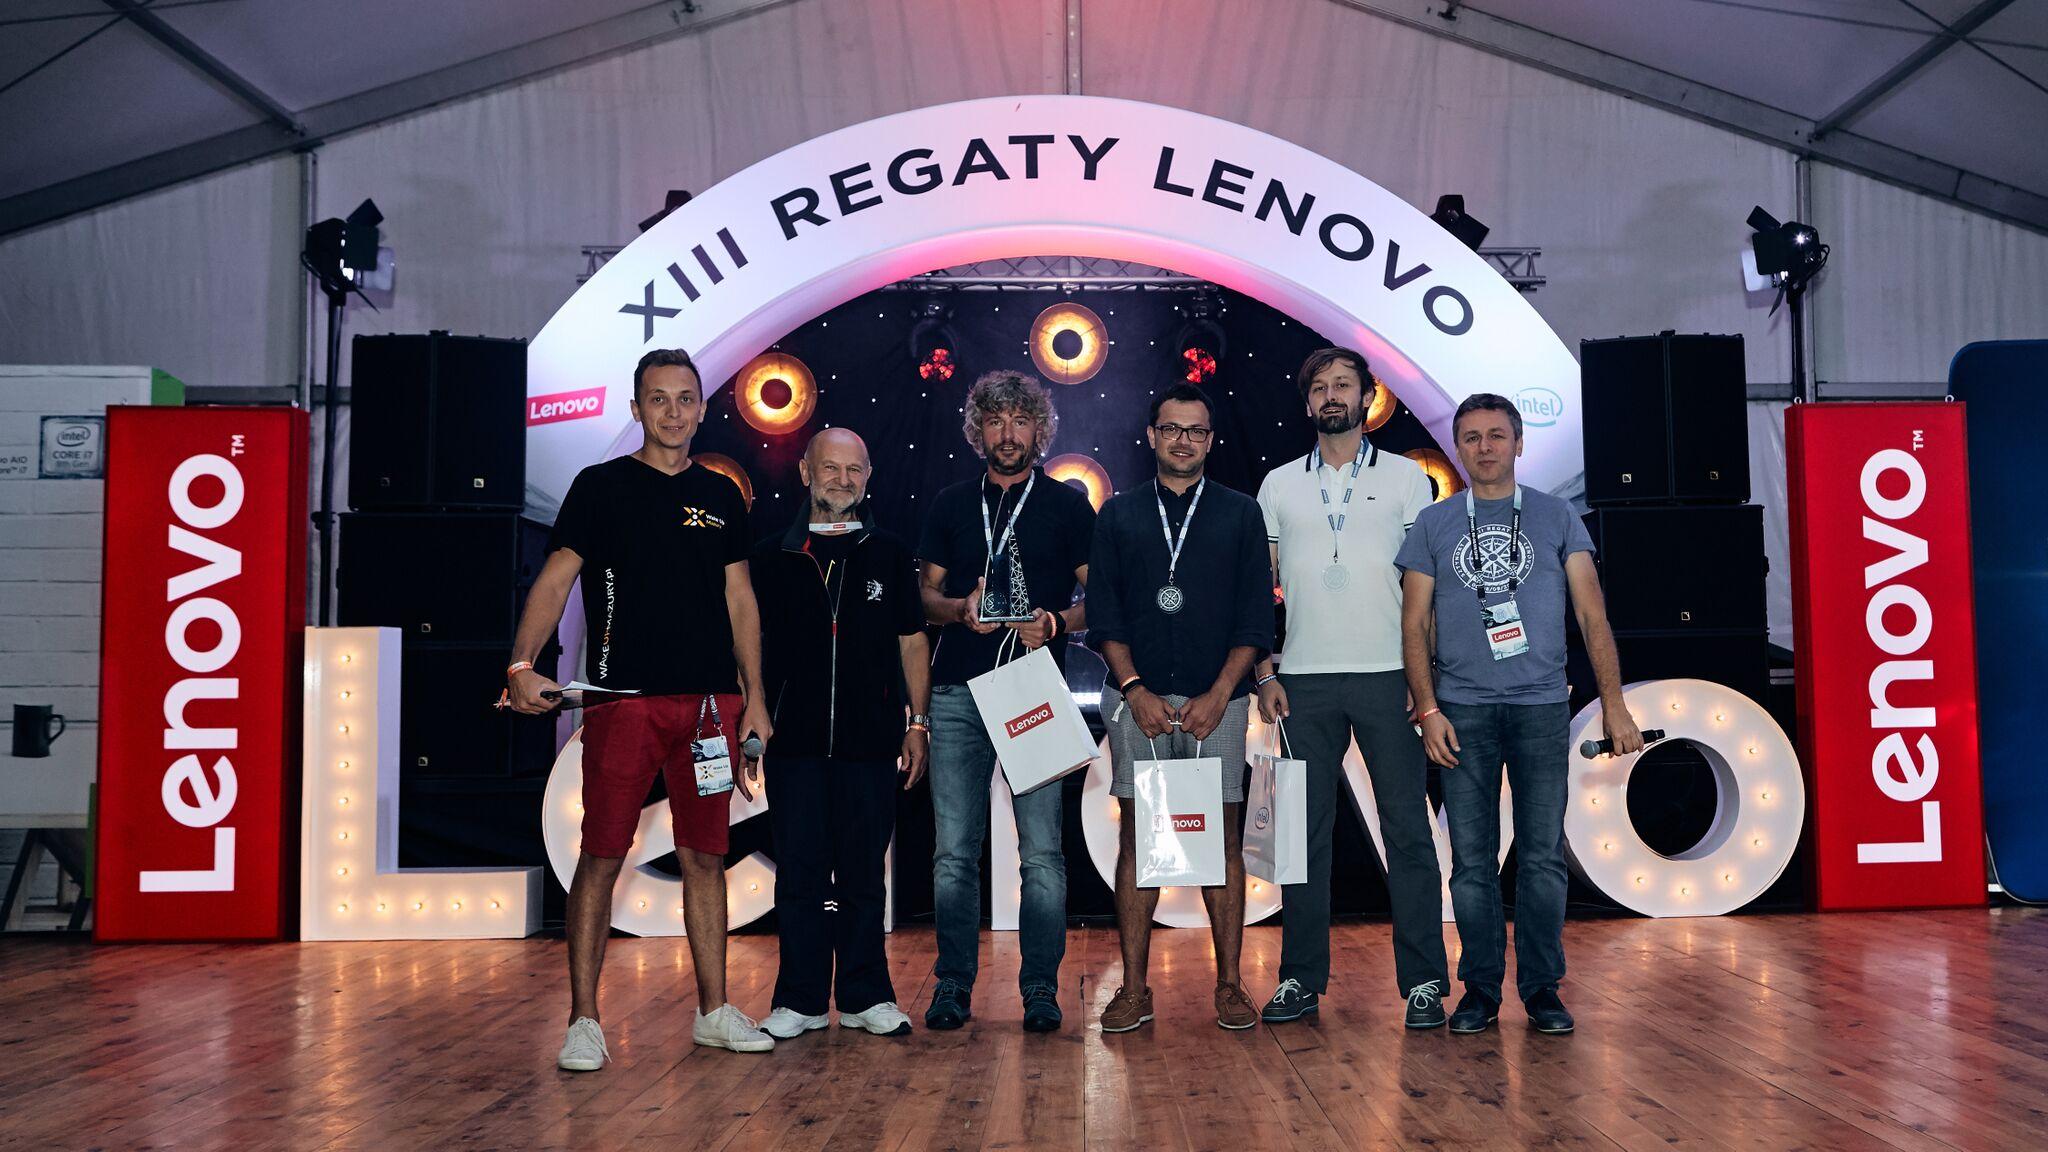 XIII Regaty Lenovo